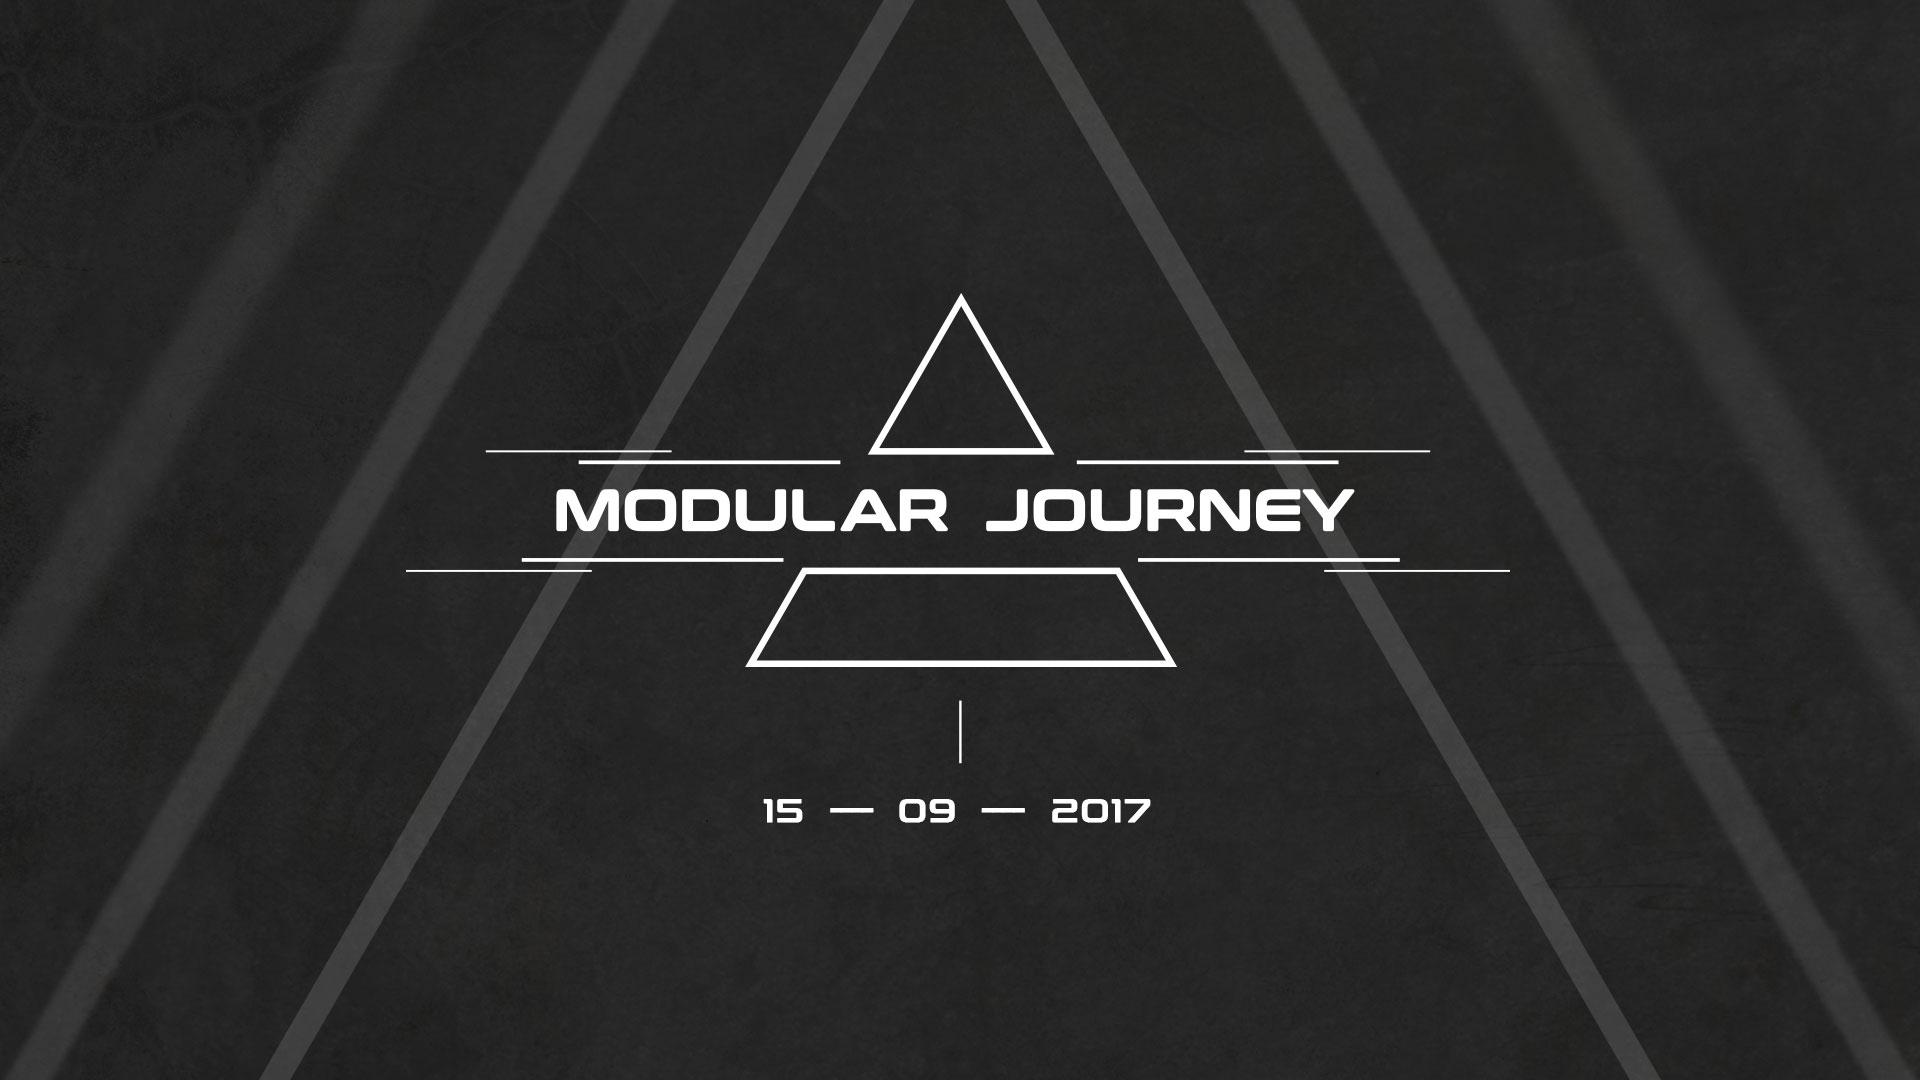 Modular Journey no. 2